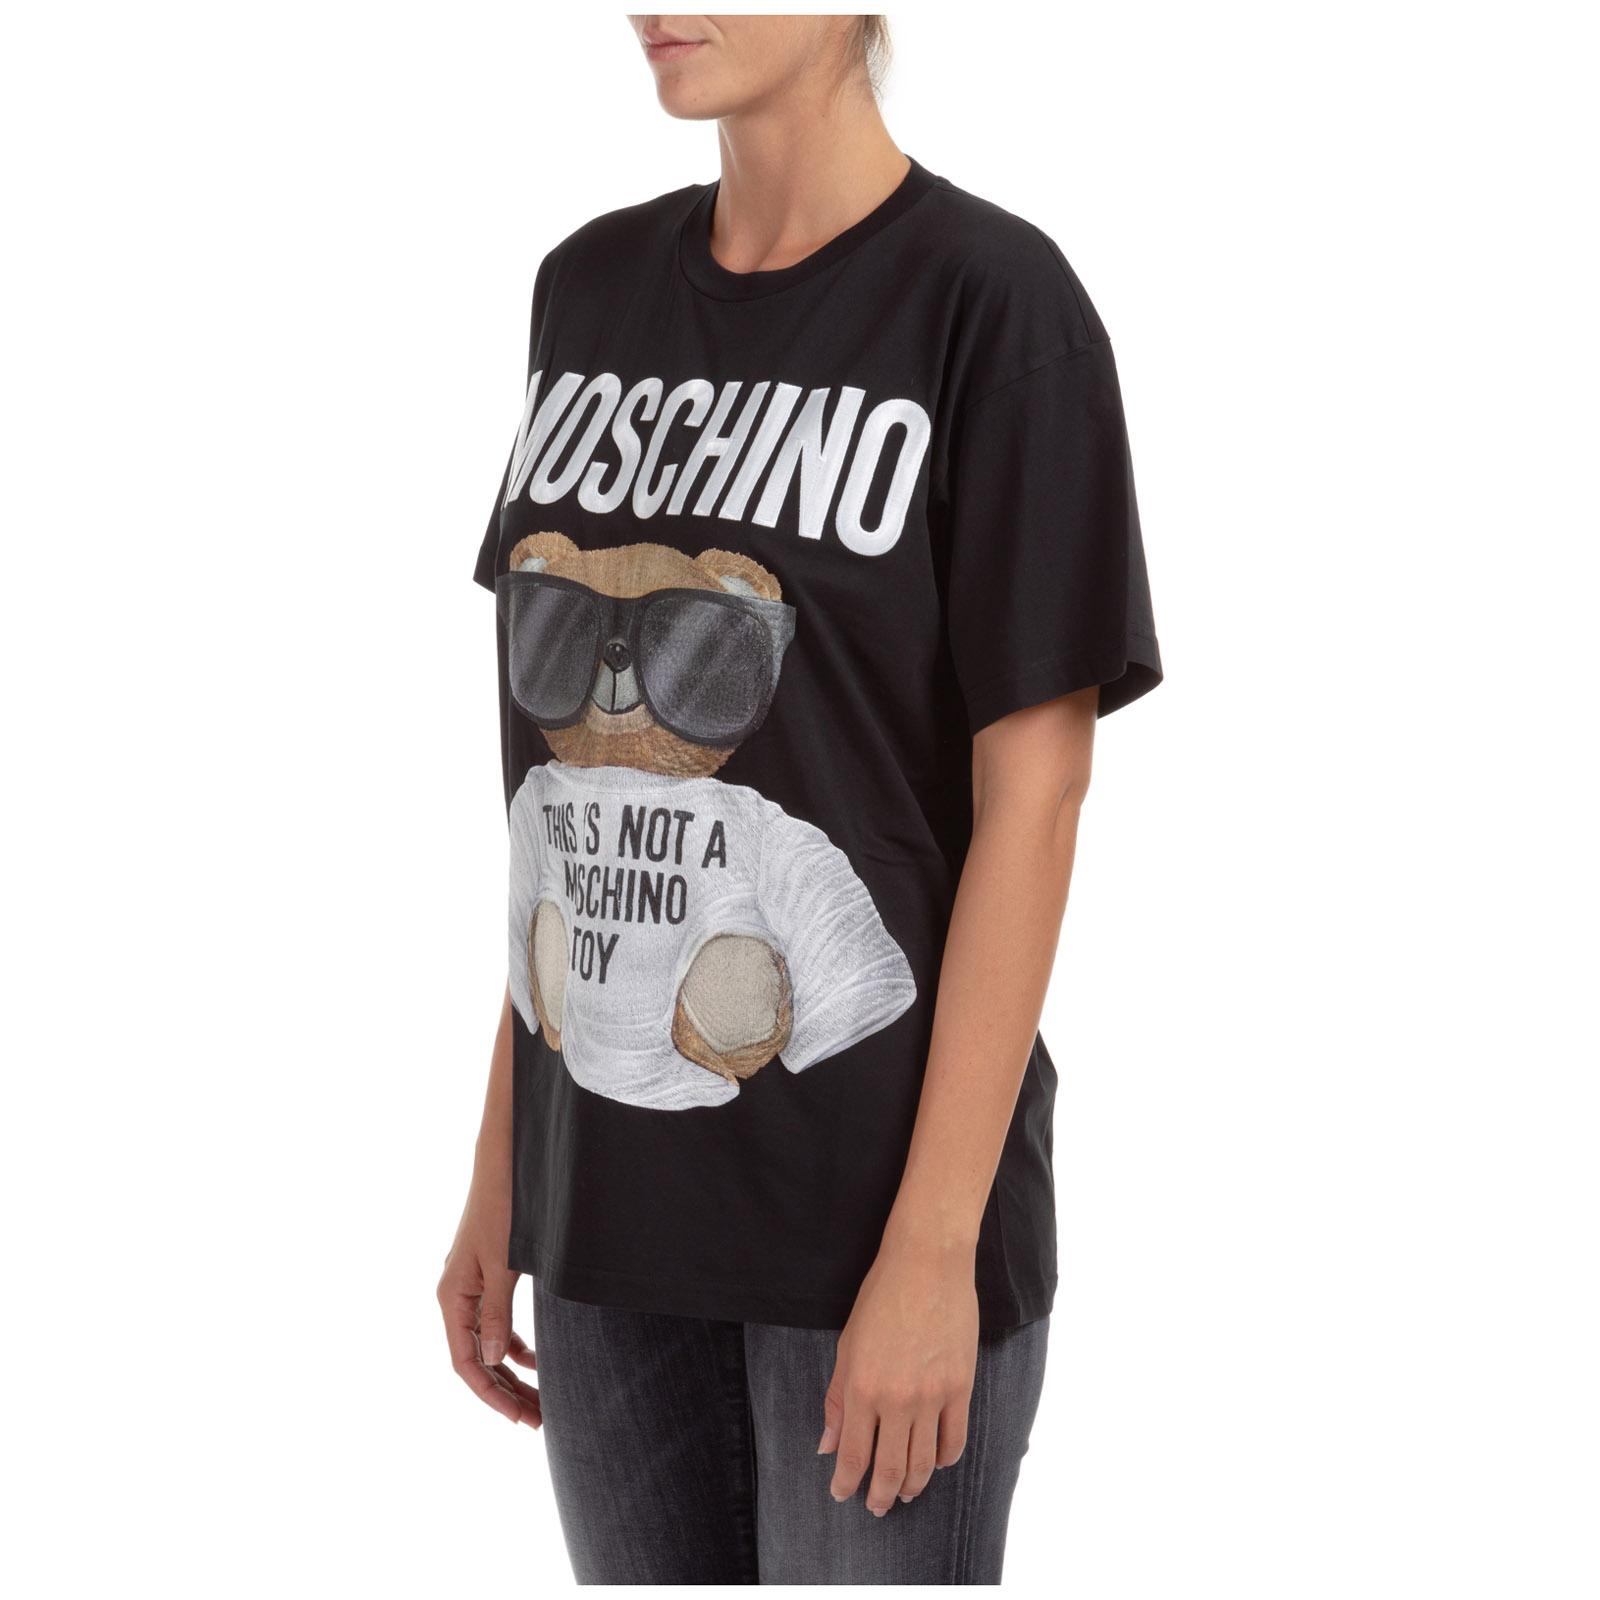 Women's t-shirt short sleeve crew neck round teddy bear